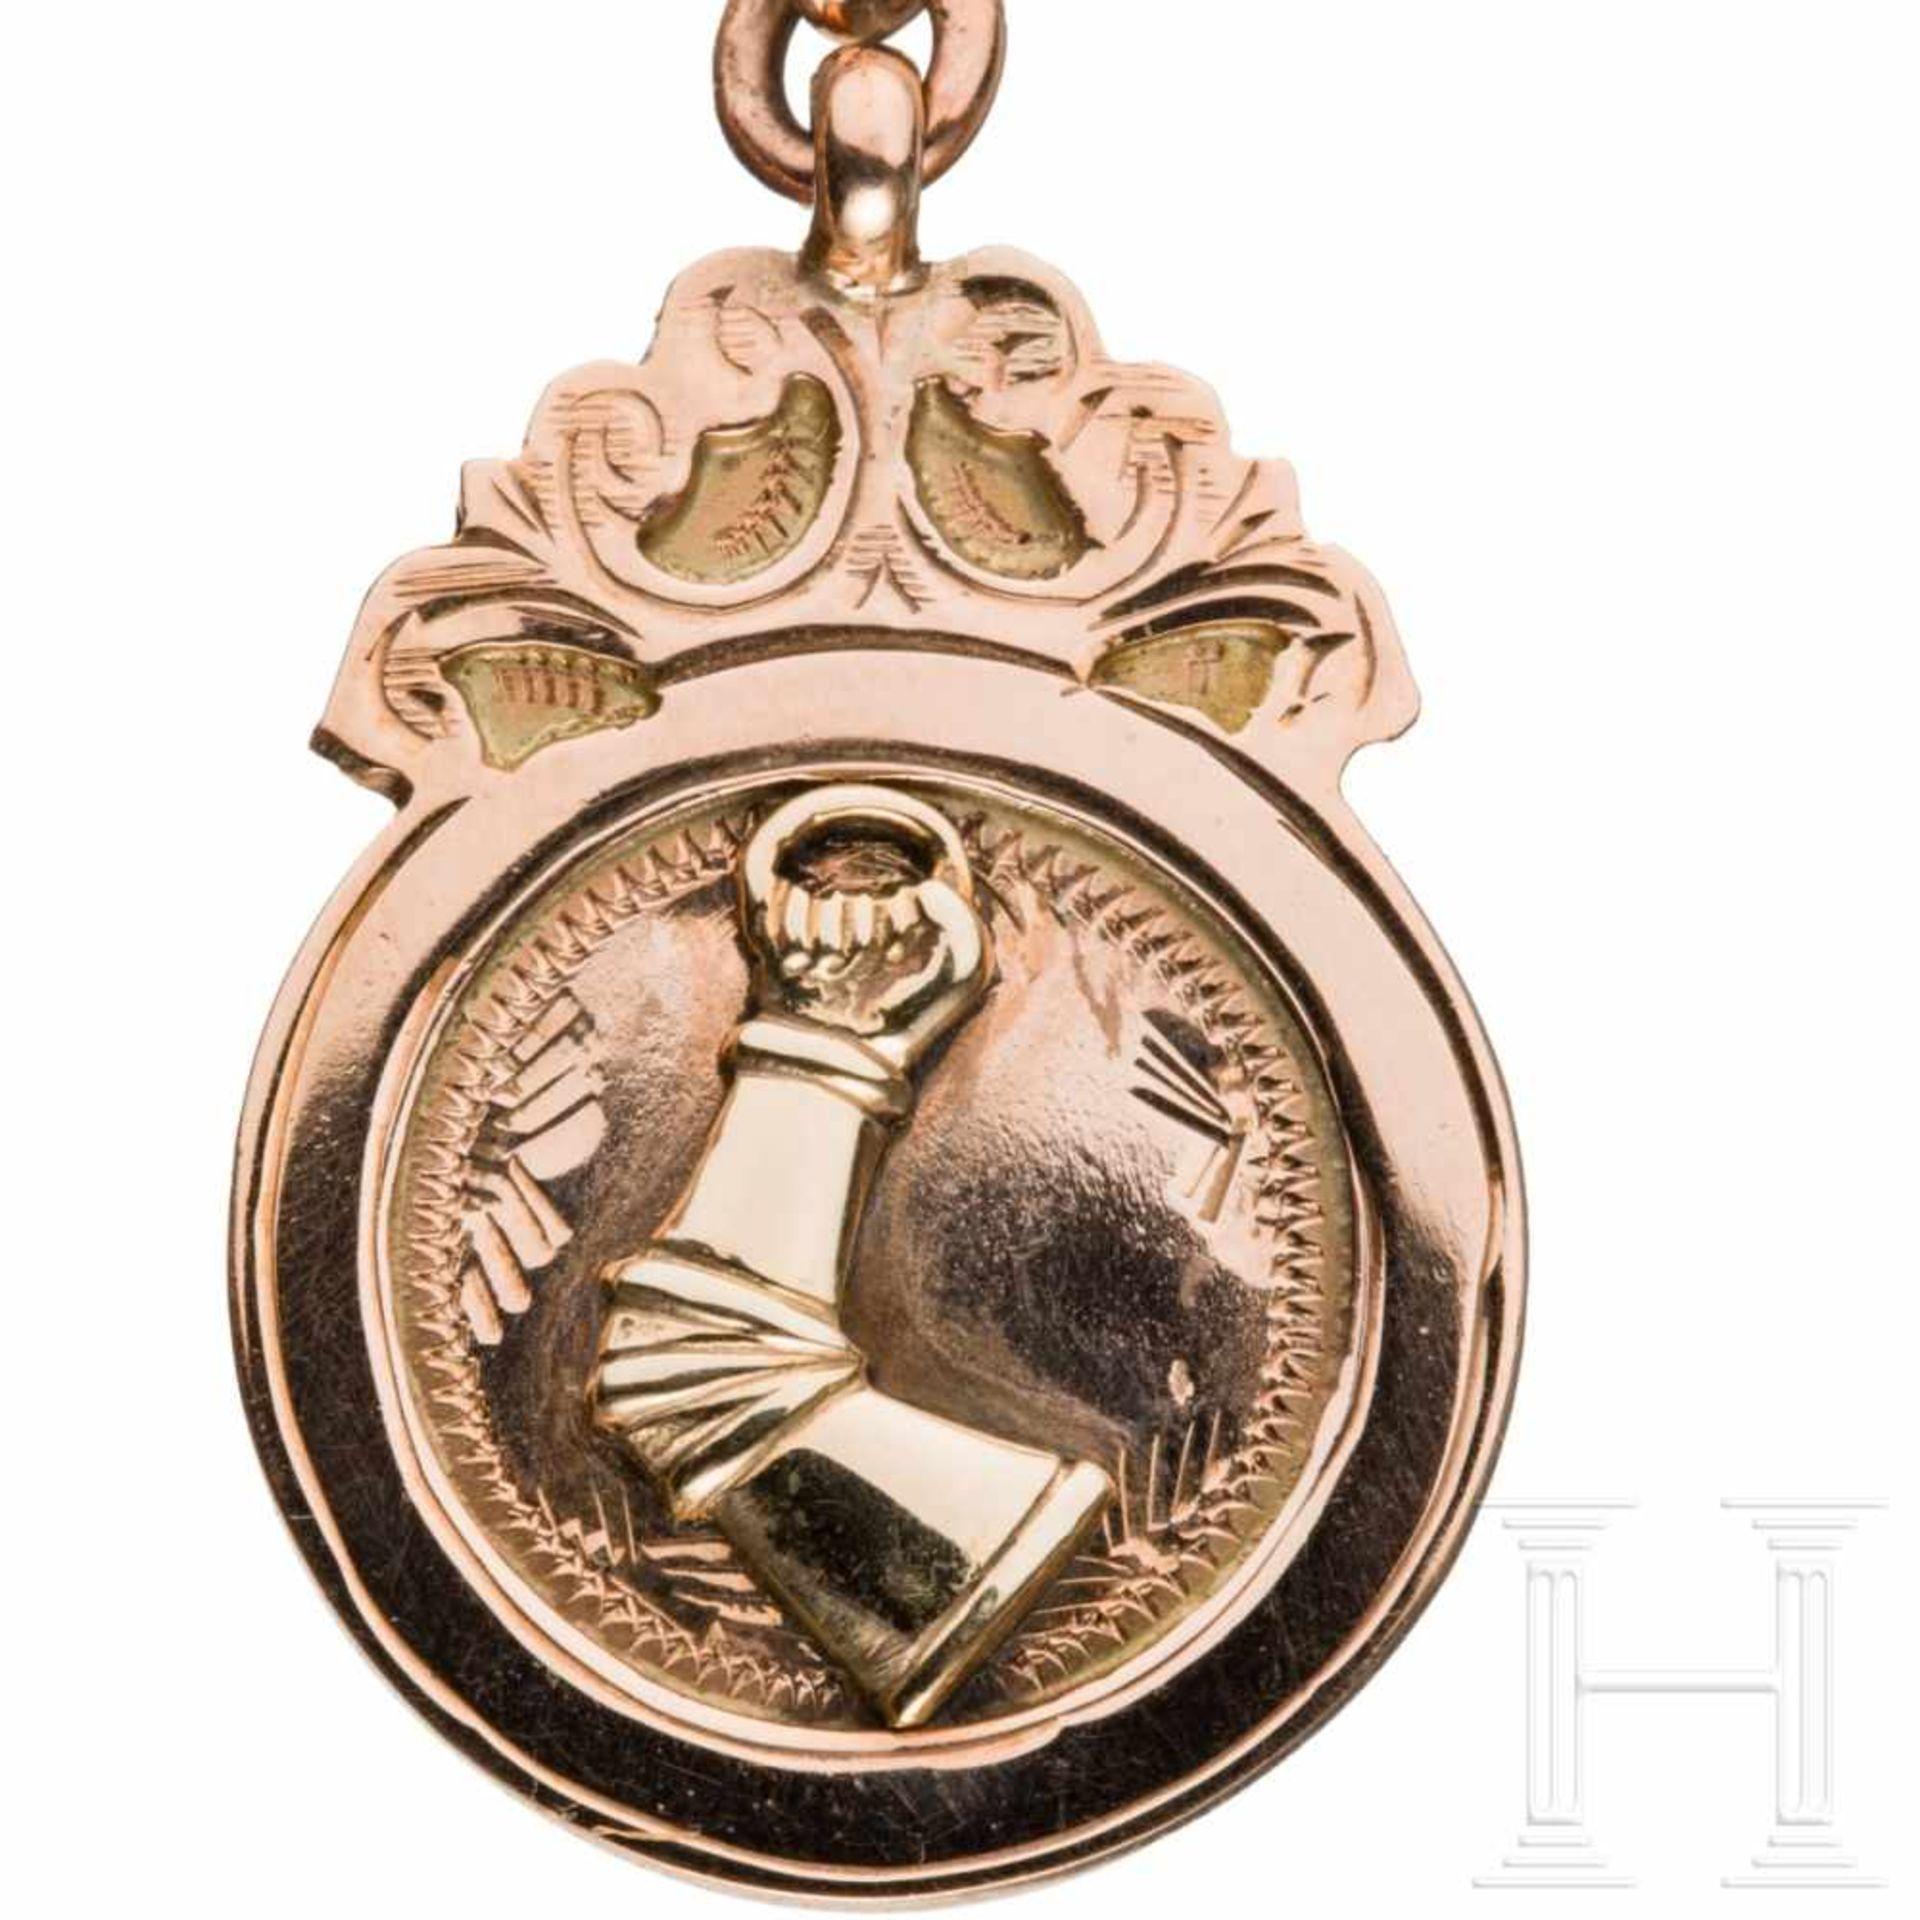 Los 6044 - A gold watch chain with the coat of arms of Hermann GoeringRotgoldene Panzerkette mit Karabinerhaken